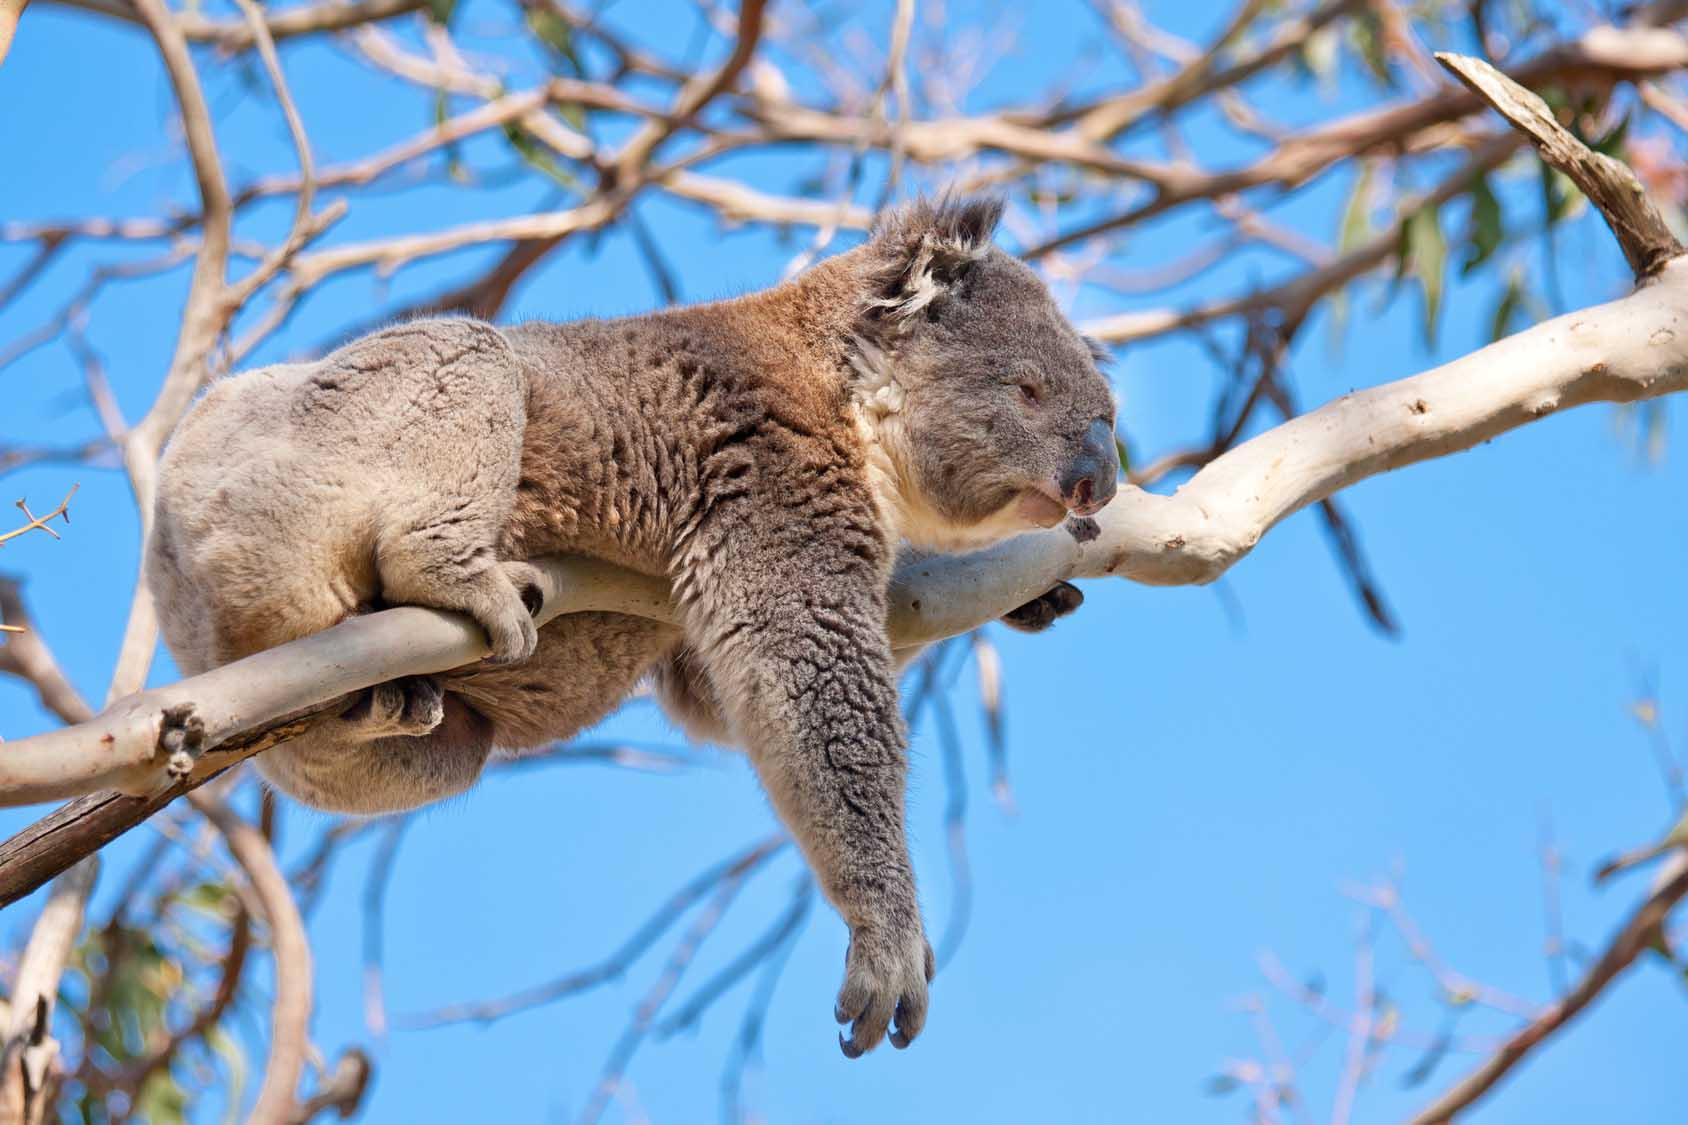 A koala in lazes around in Taronga Zoo, Mosman, Sydney